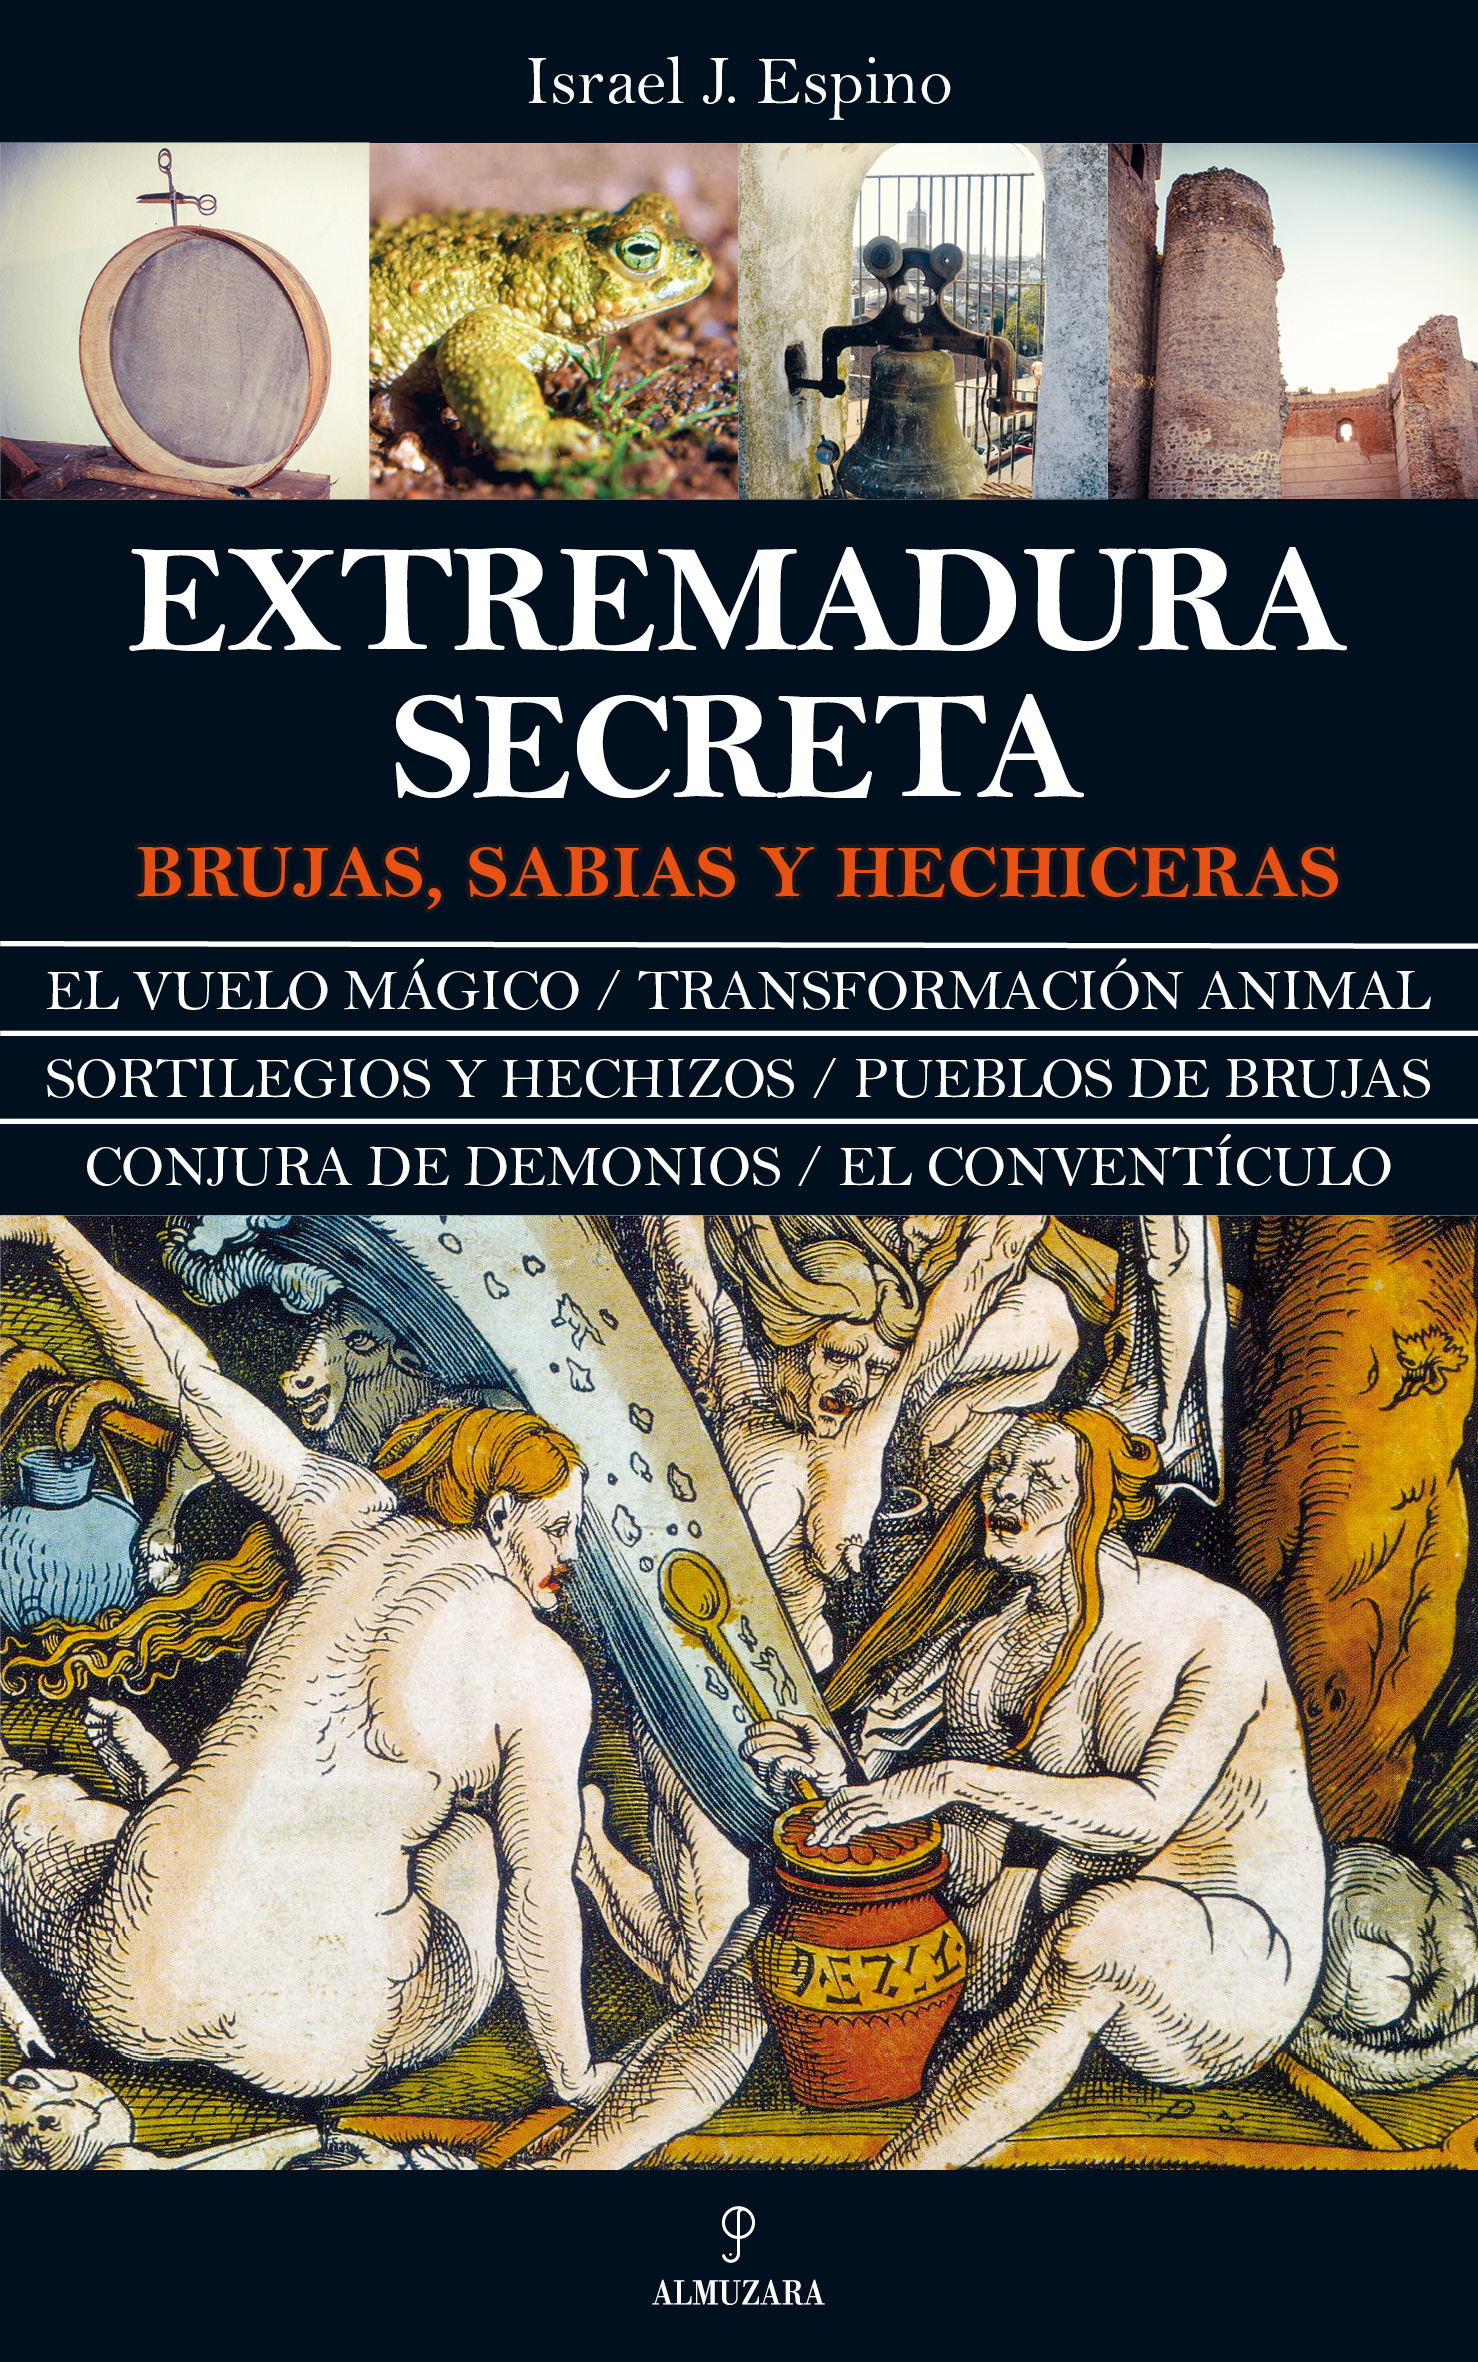 Portada Extremadura Secreta. Brujas, sabias, hechiceras.